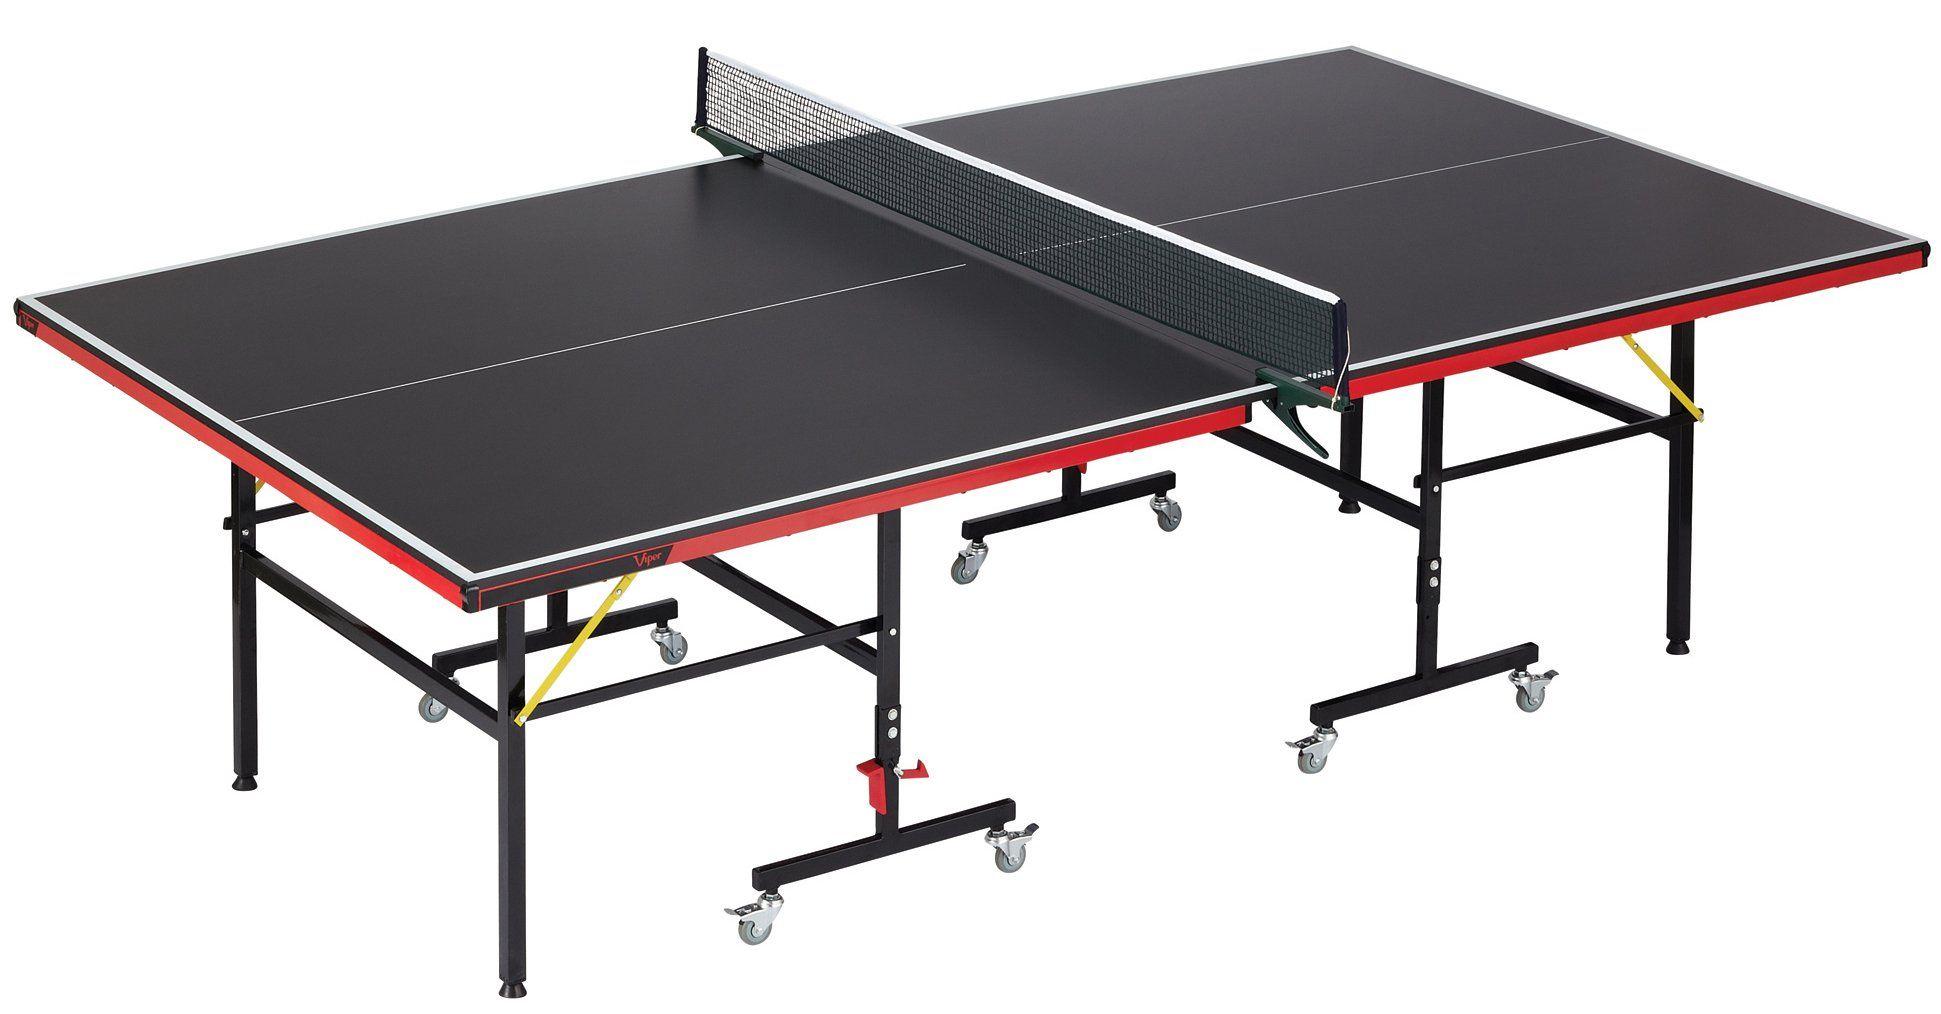 Viper Arlington Indoor Table Tennis Table 408 2 Separate Pieces